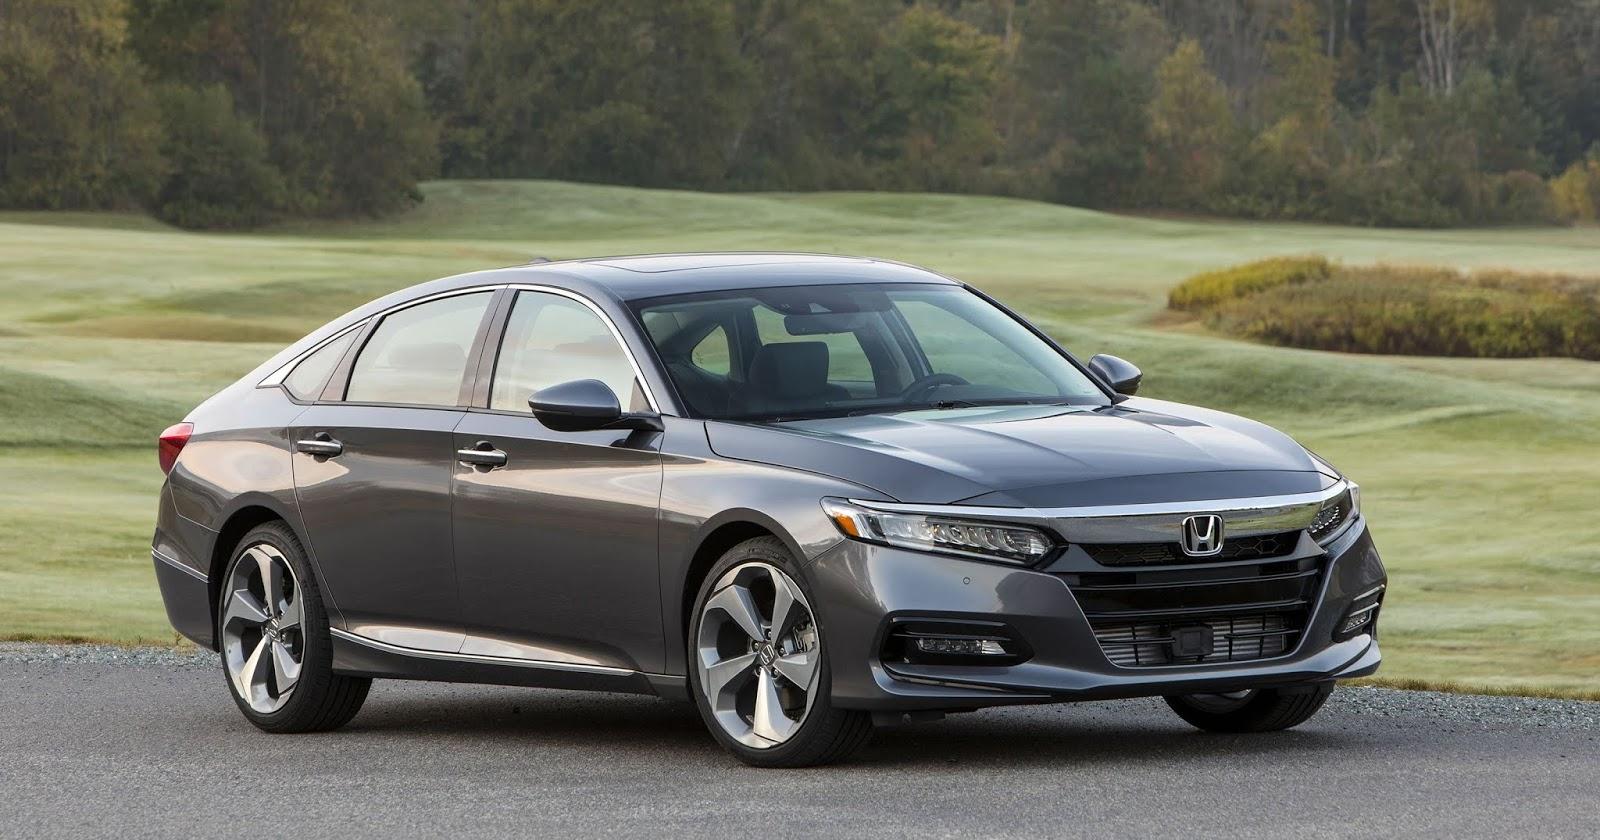 Honda Accord Turbo >> Review Mobil Baru First Impression Honda Accord Turbo 2019